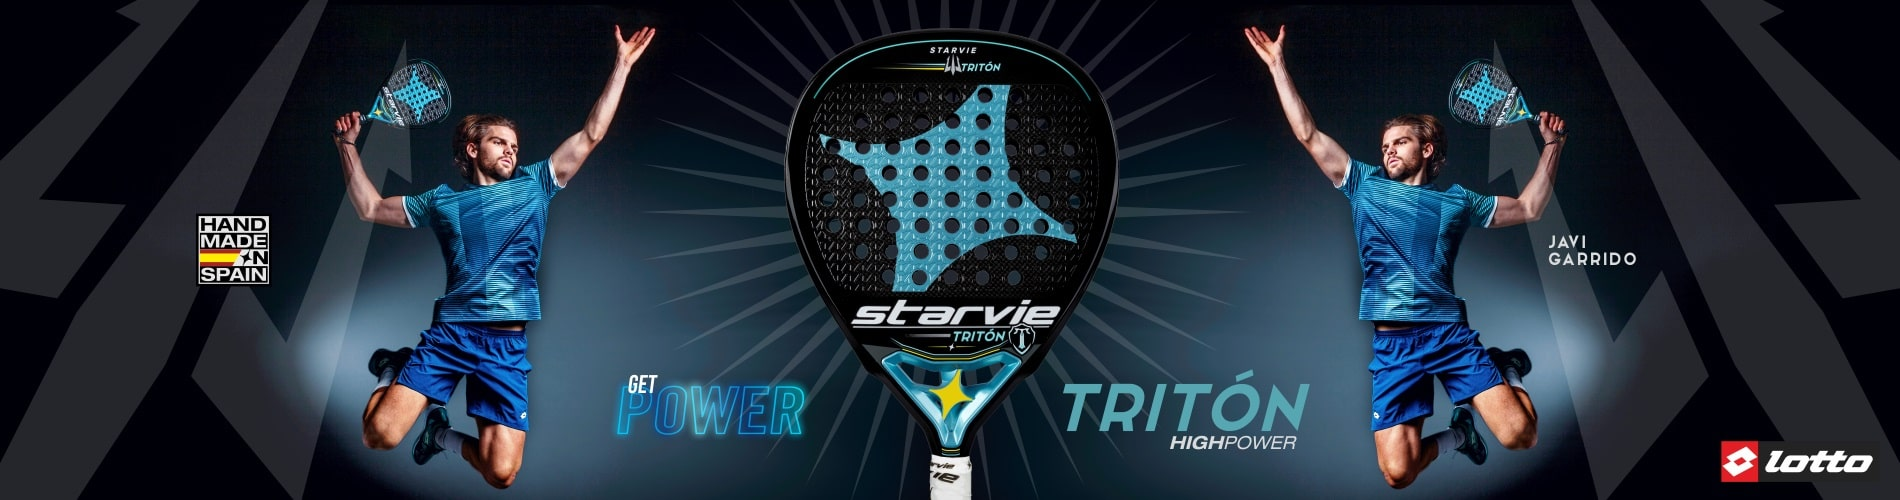 Triton StarVie padel racket with teardrop shape